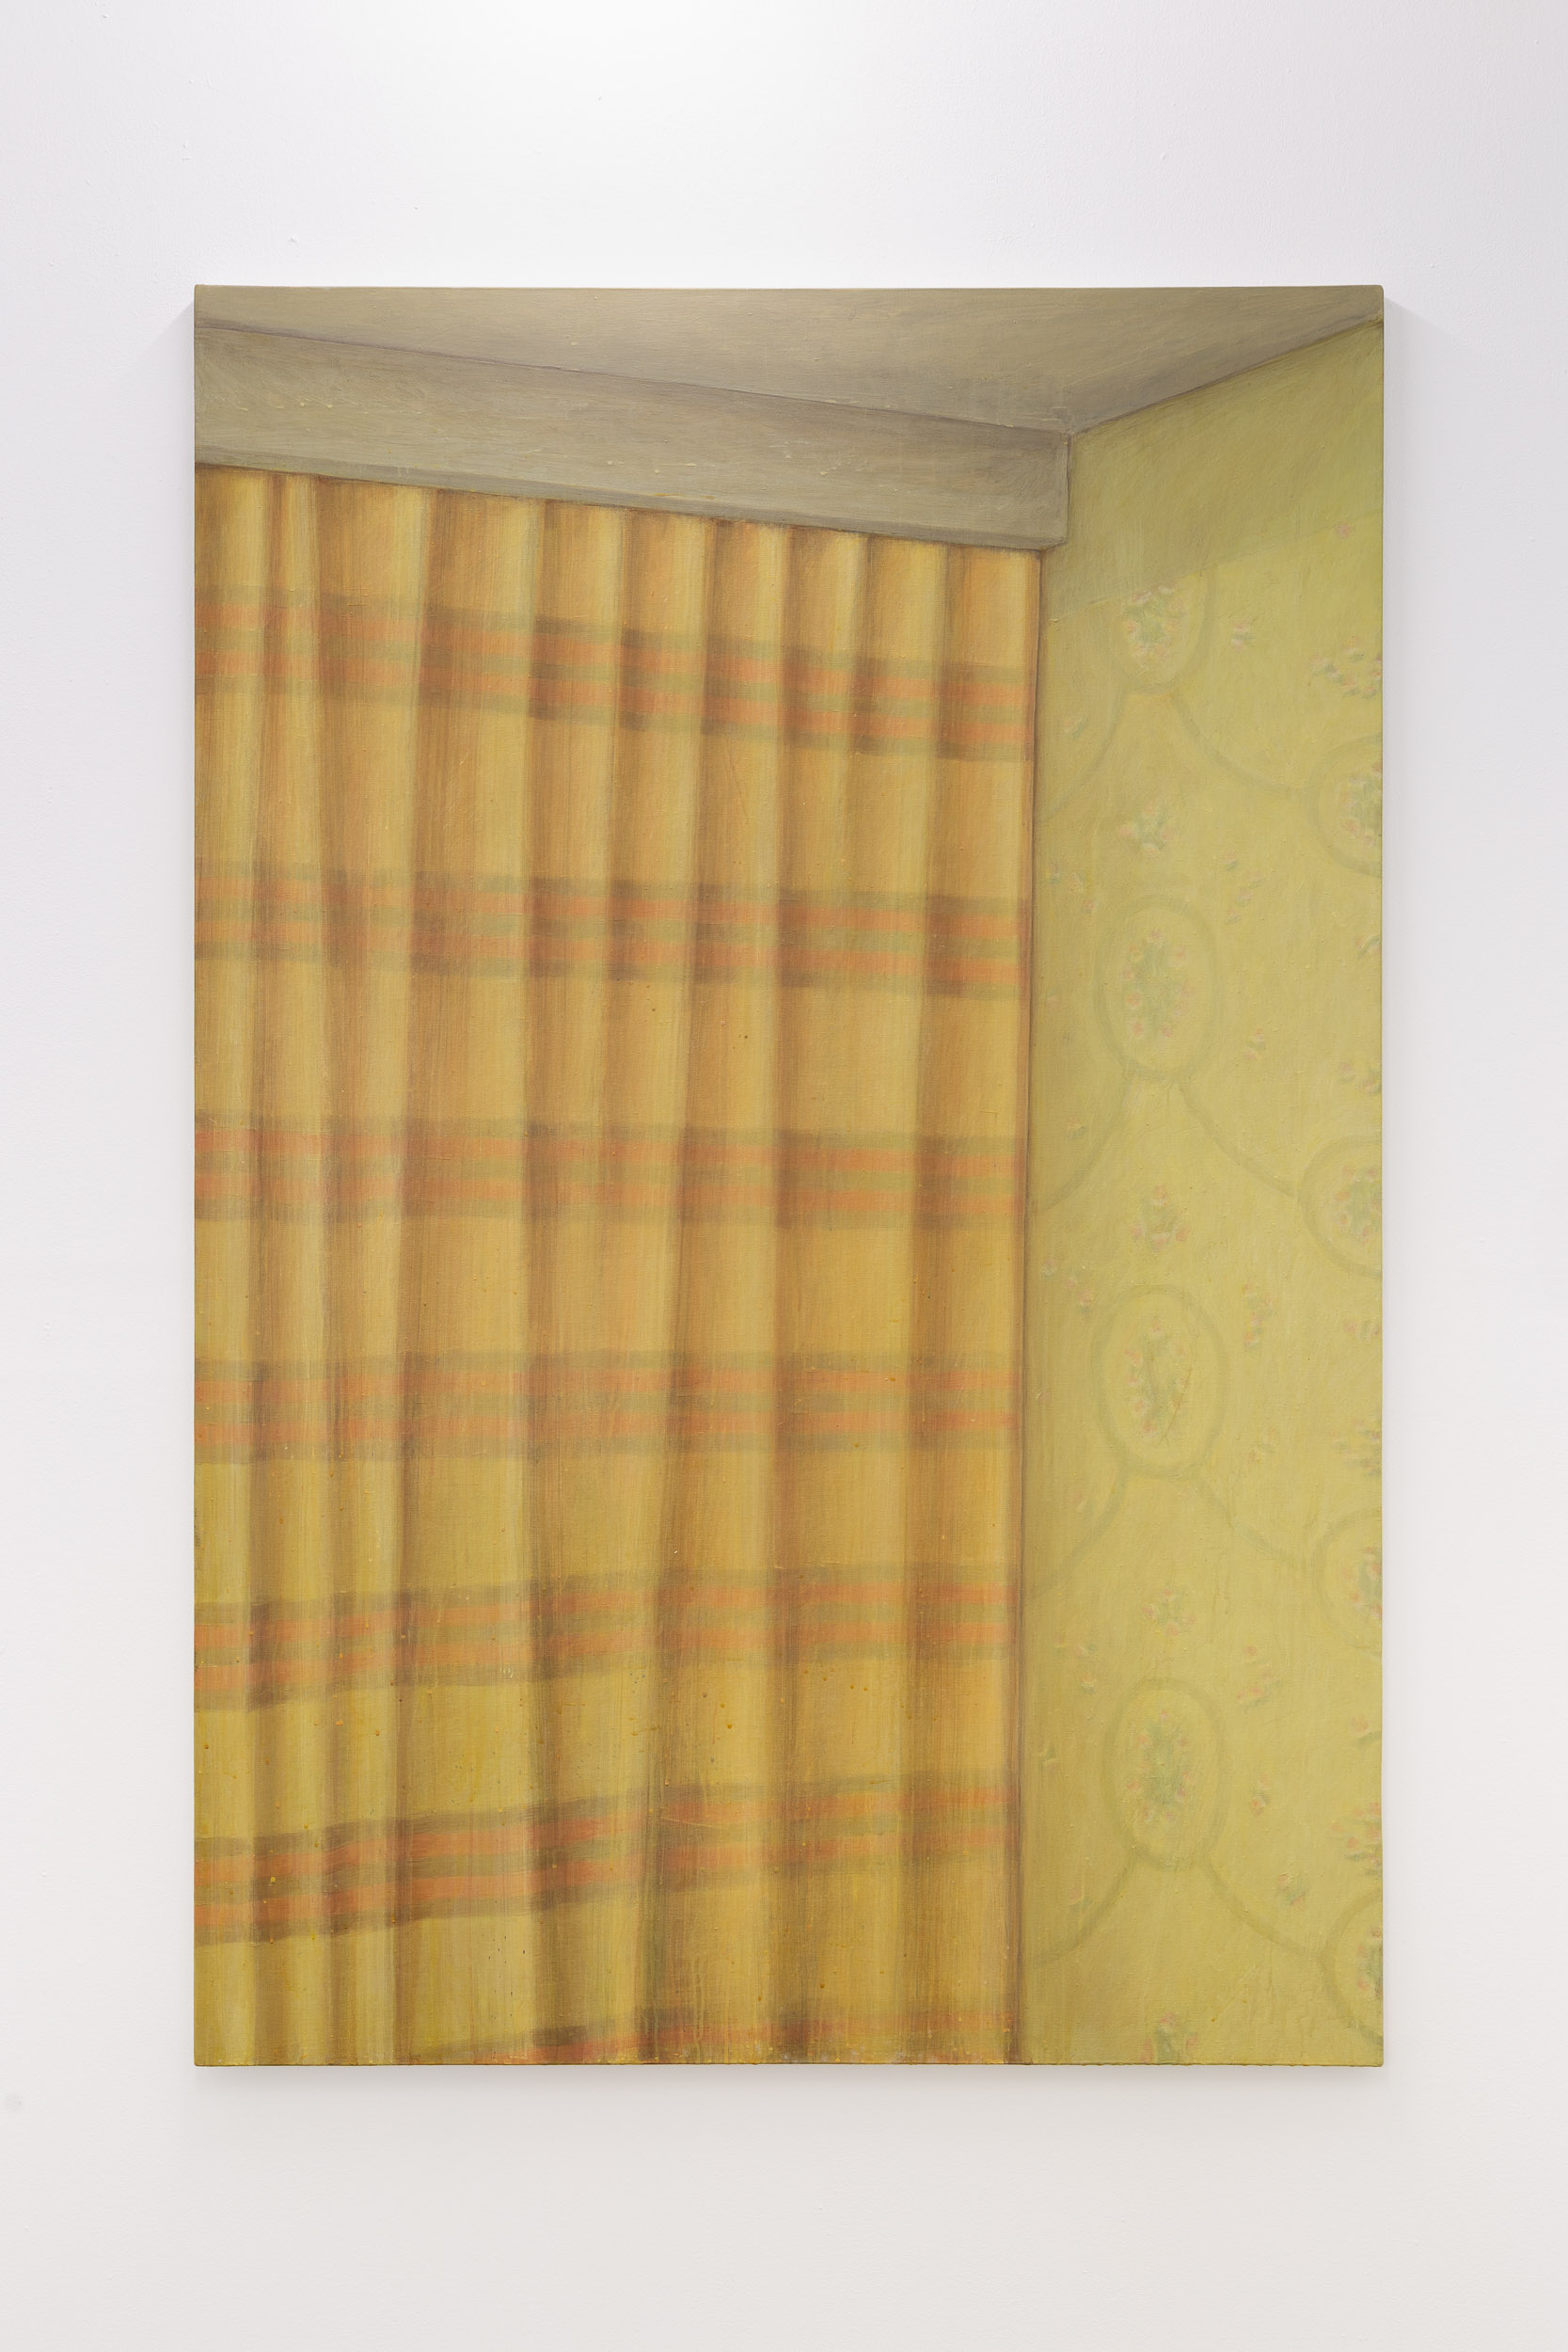 Christoph Hänsli,  Interior , 2000, egg tempera and acrylic on canvas, 164 x 110 cm  Photo: Kilian Bannwart